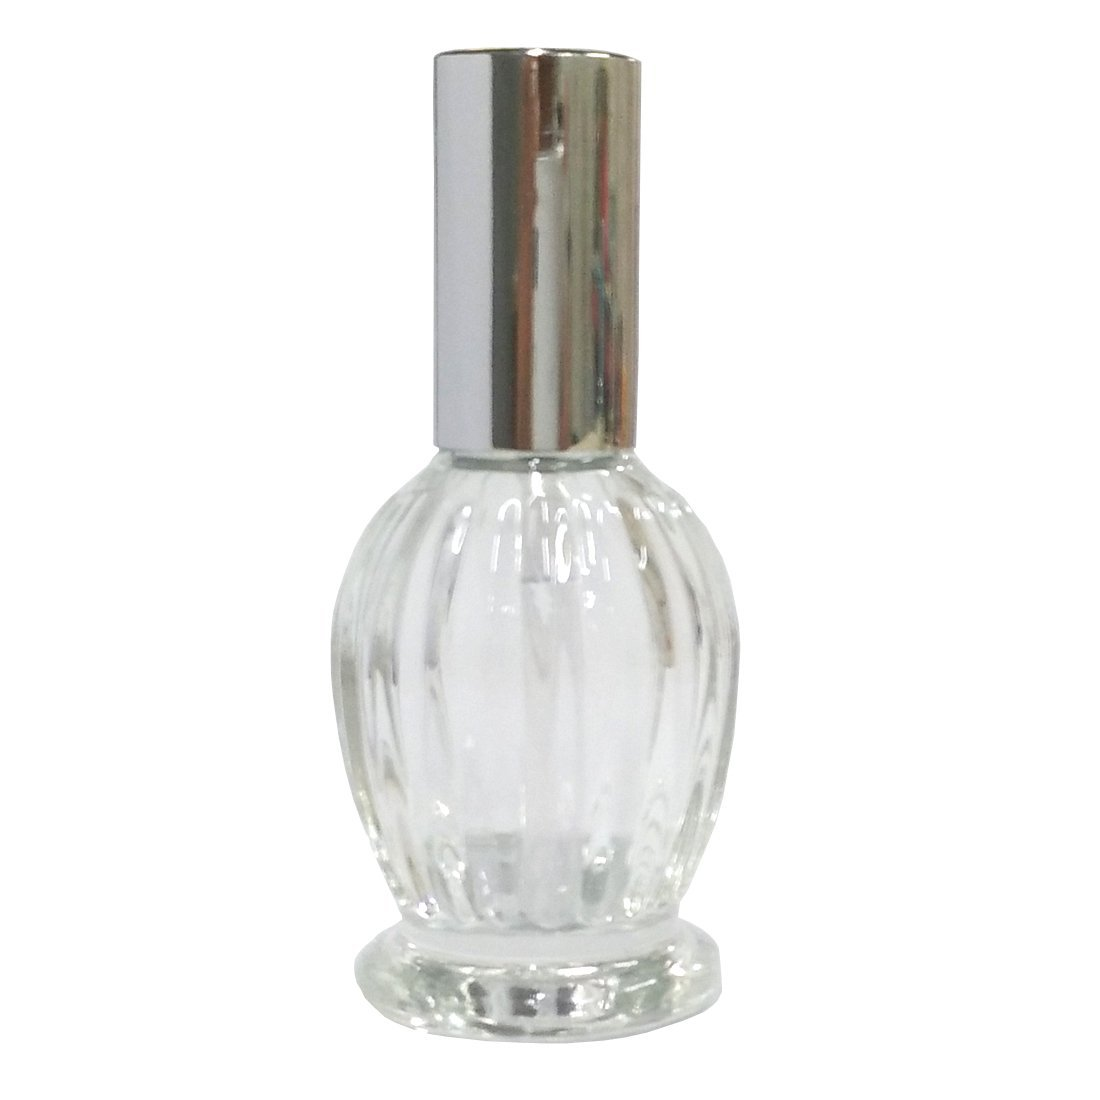 0c8cd63ba12b Cheap Perfume Purse, find Perfume Purse deals on line at Alibaba.com